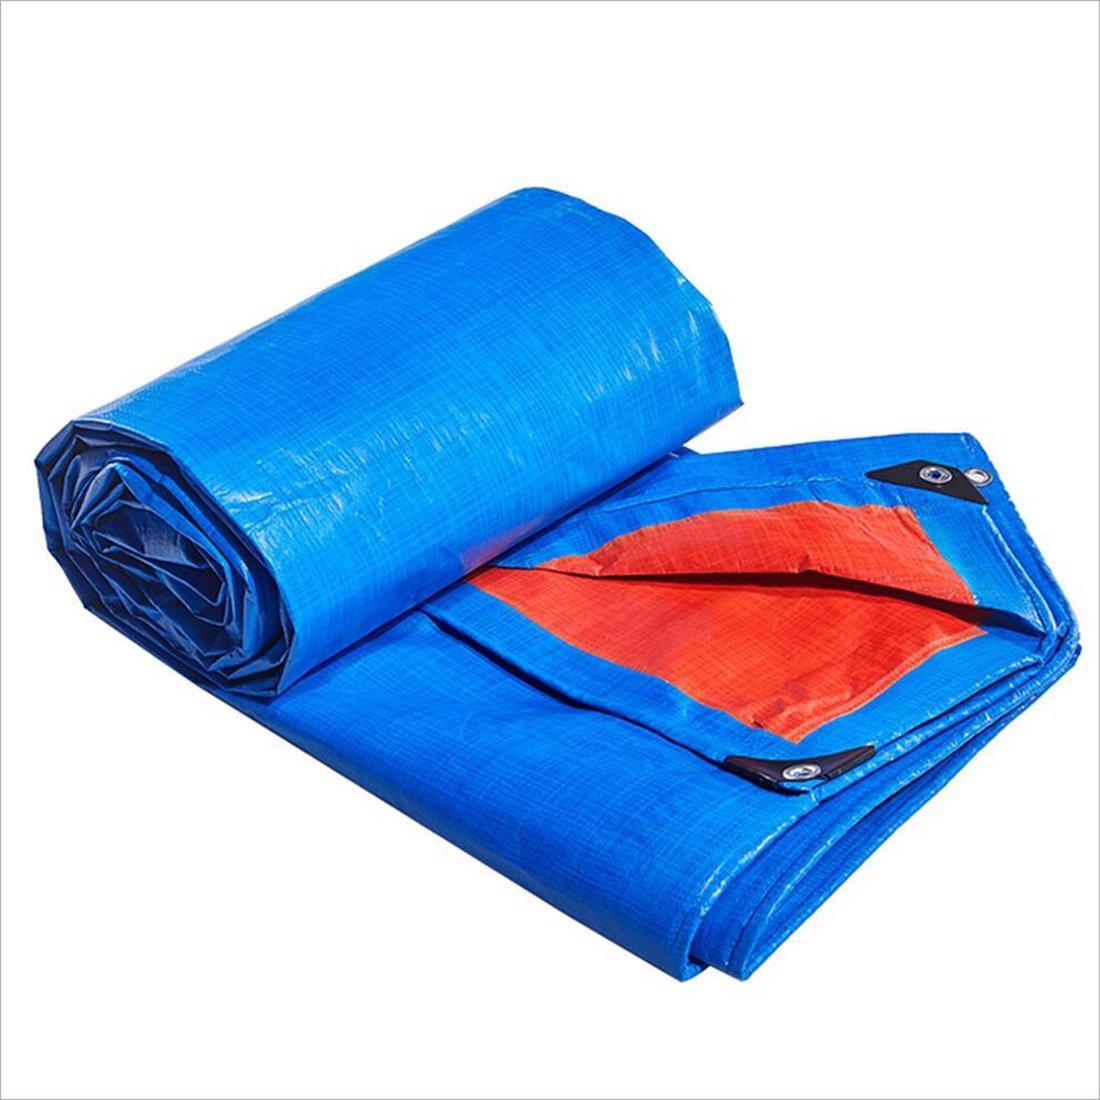 Z-Peng Bu ターポリン防水日焼け止めテントブルーレッドビニル厚いプラスチックポンチョの防水カーレインカバーサイズの様々 ++ (サイズ さいず : 5mx7m) 5mx7m  B07JMP6CD3